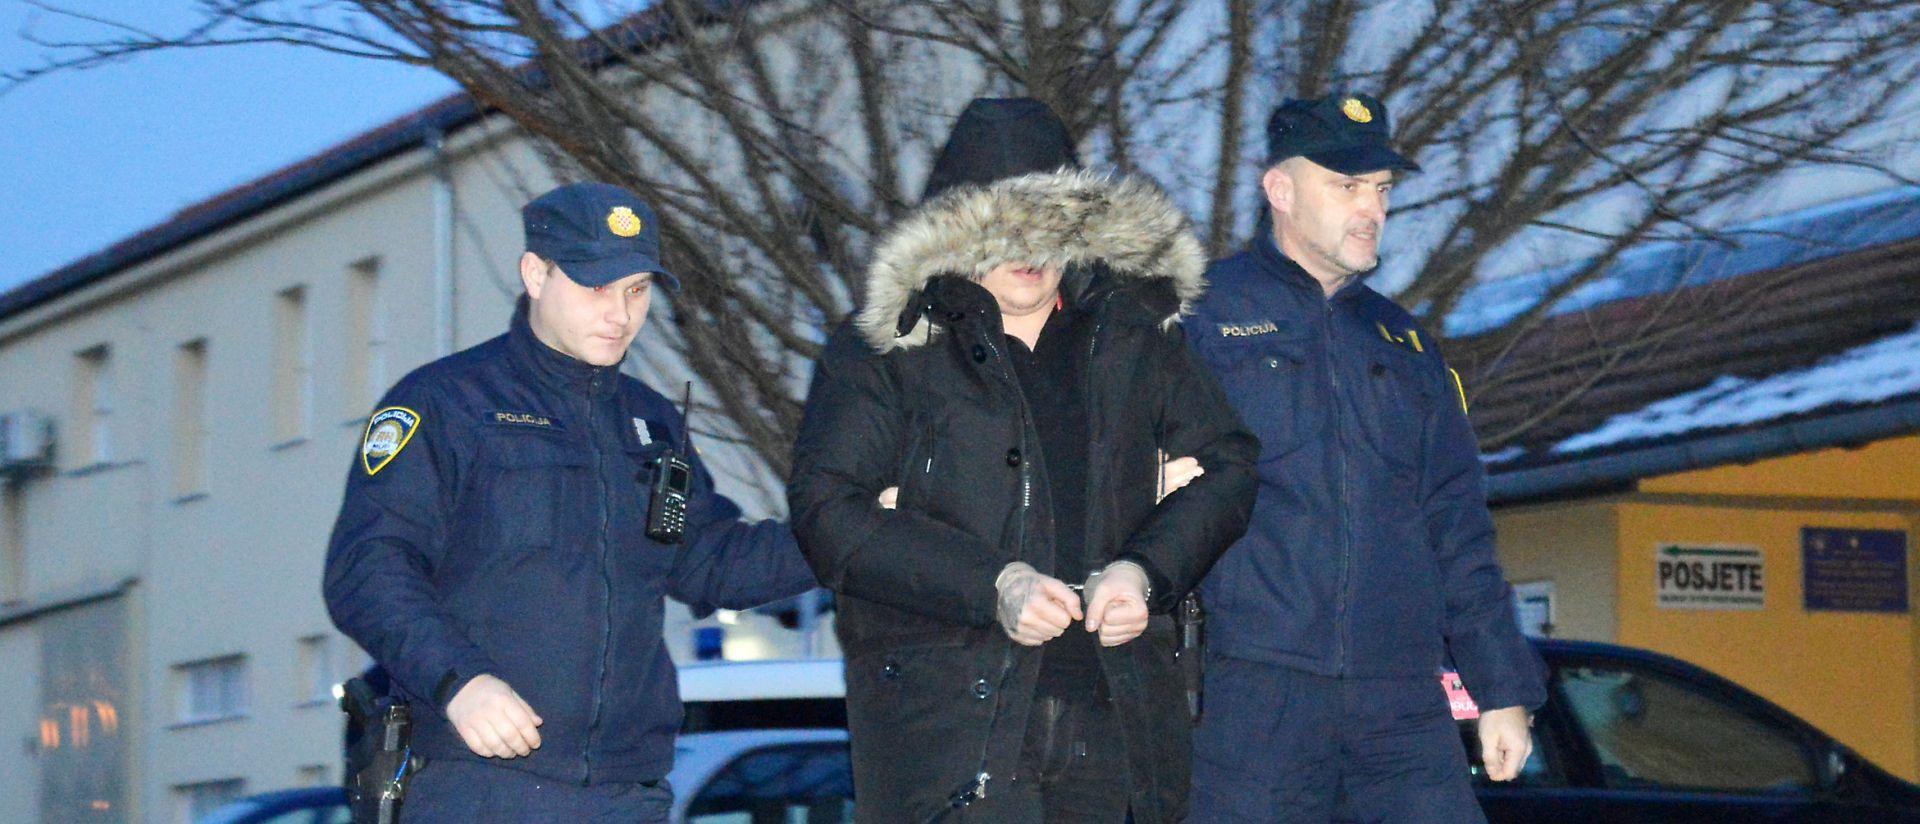 BJELOVAR Ivan Đakić na Županijskom sudu